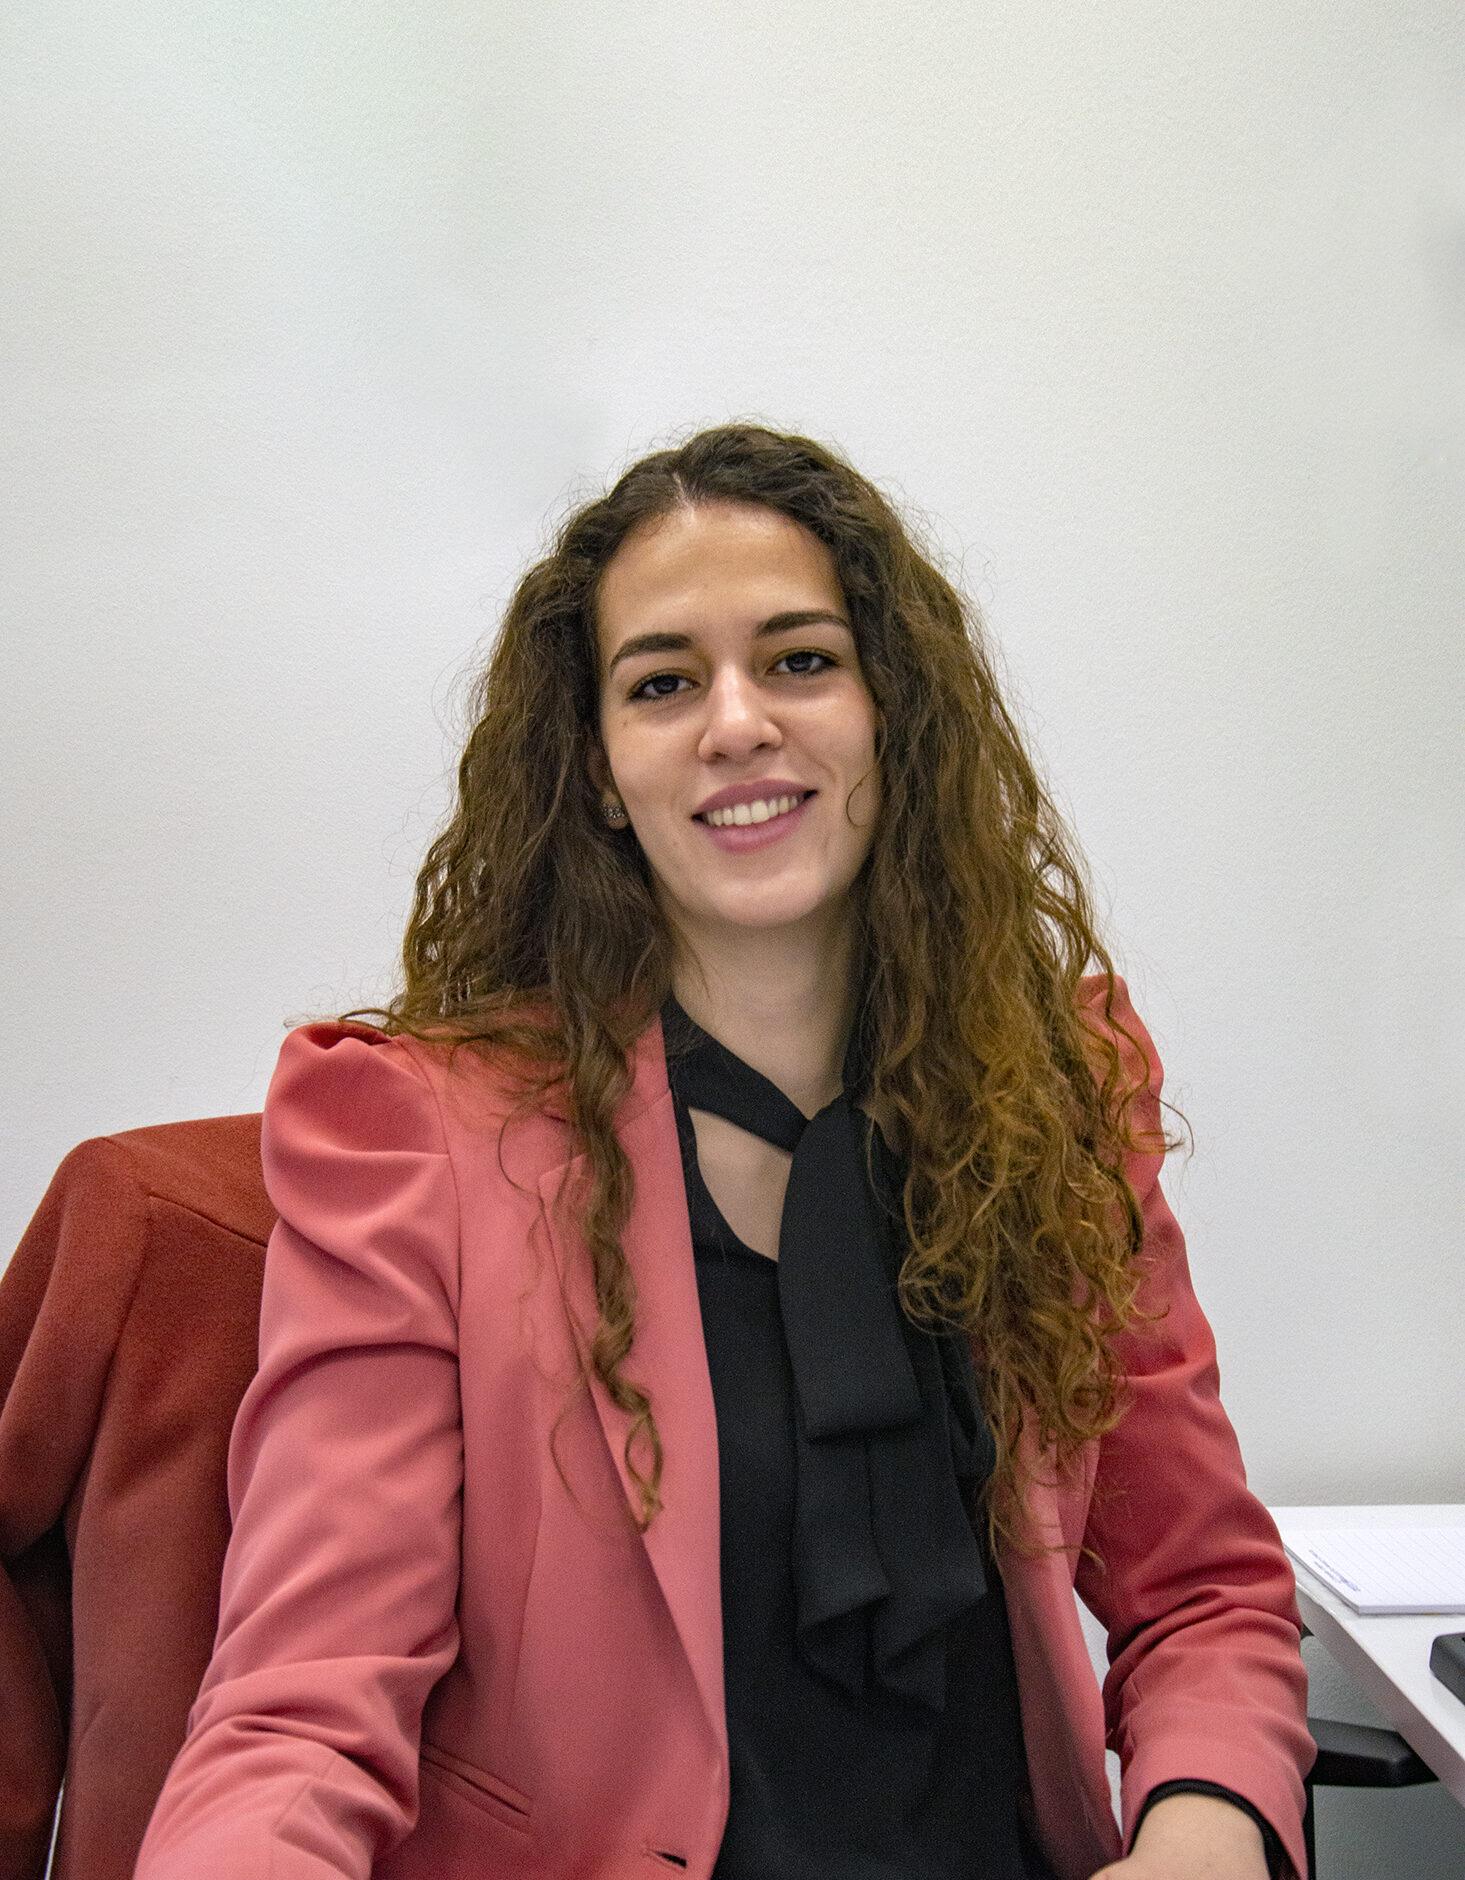 Carolina Franci